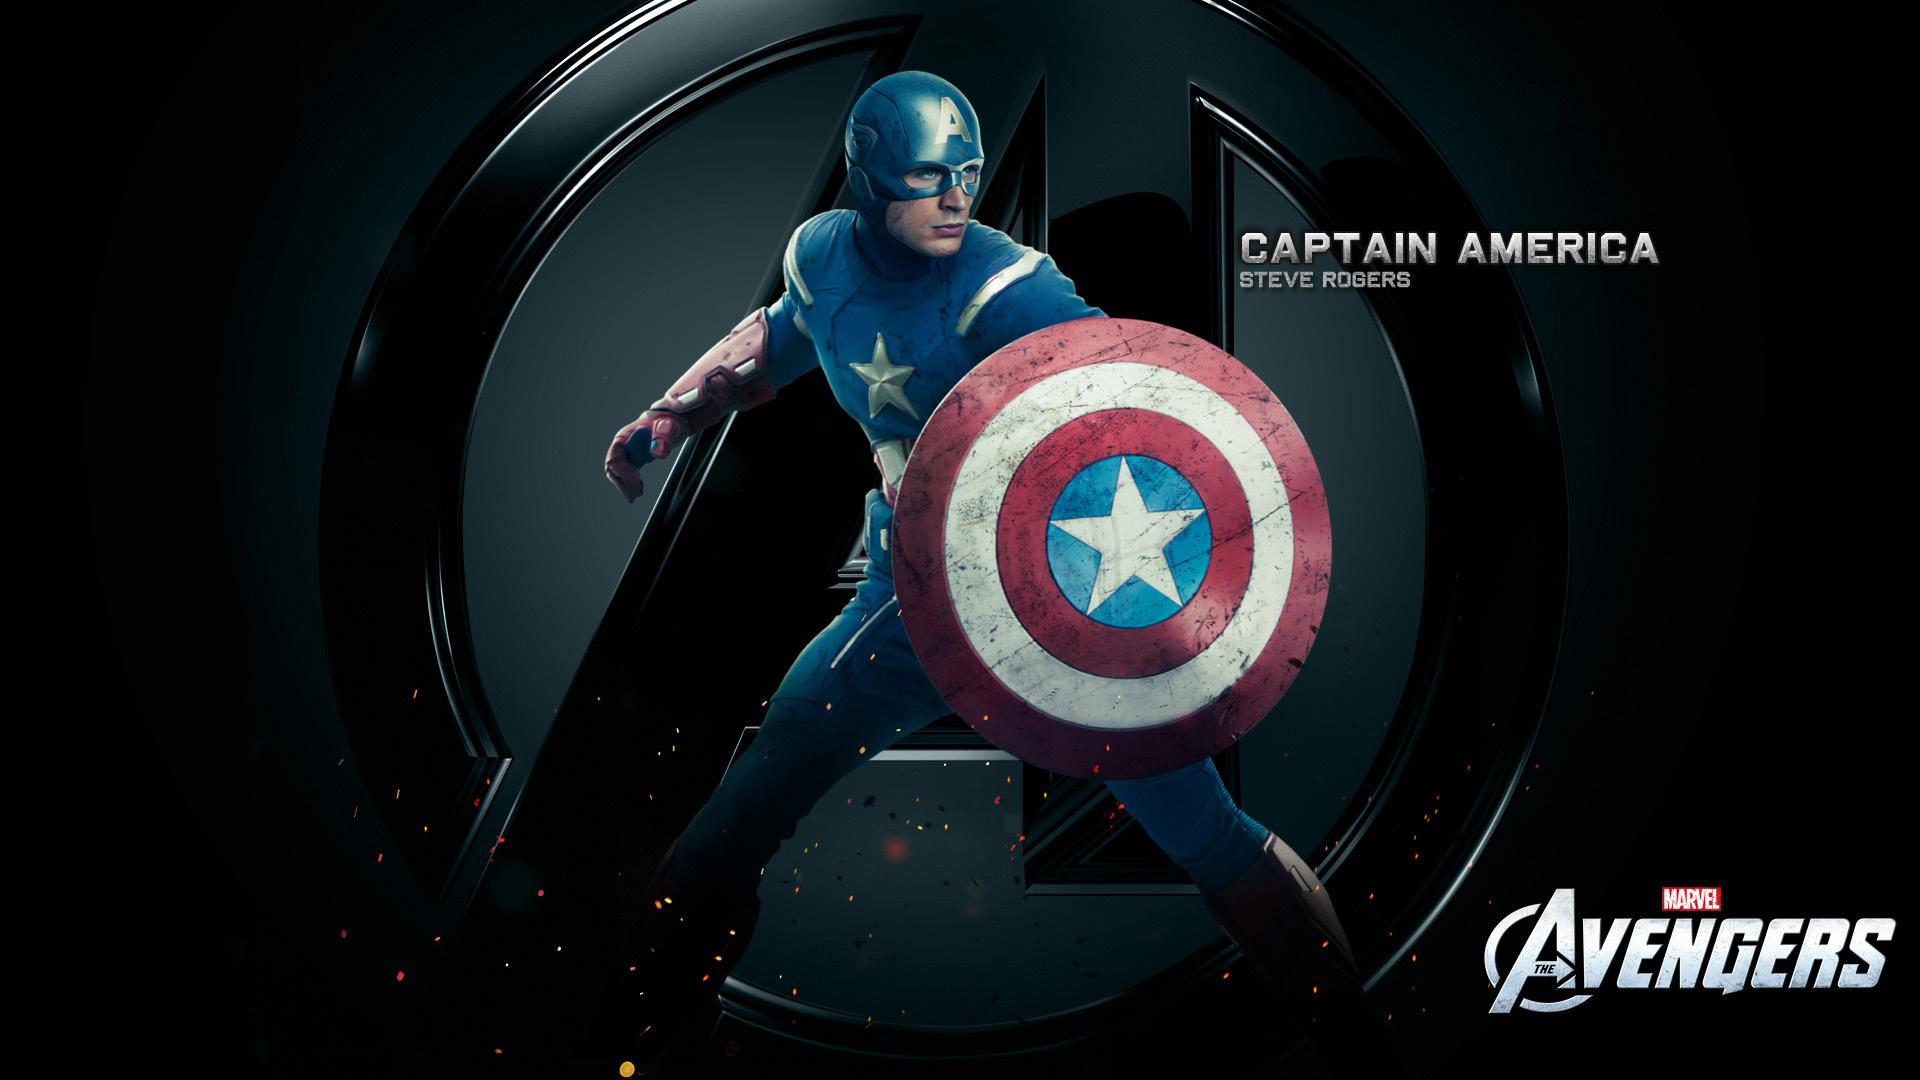 Обои Крис эванс, chris evans, мстители, steve rogers, captain america, the avengers. Фильмы foto 12